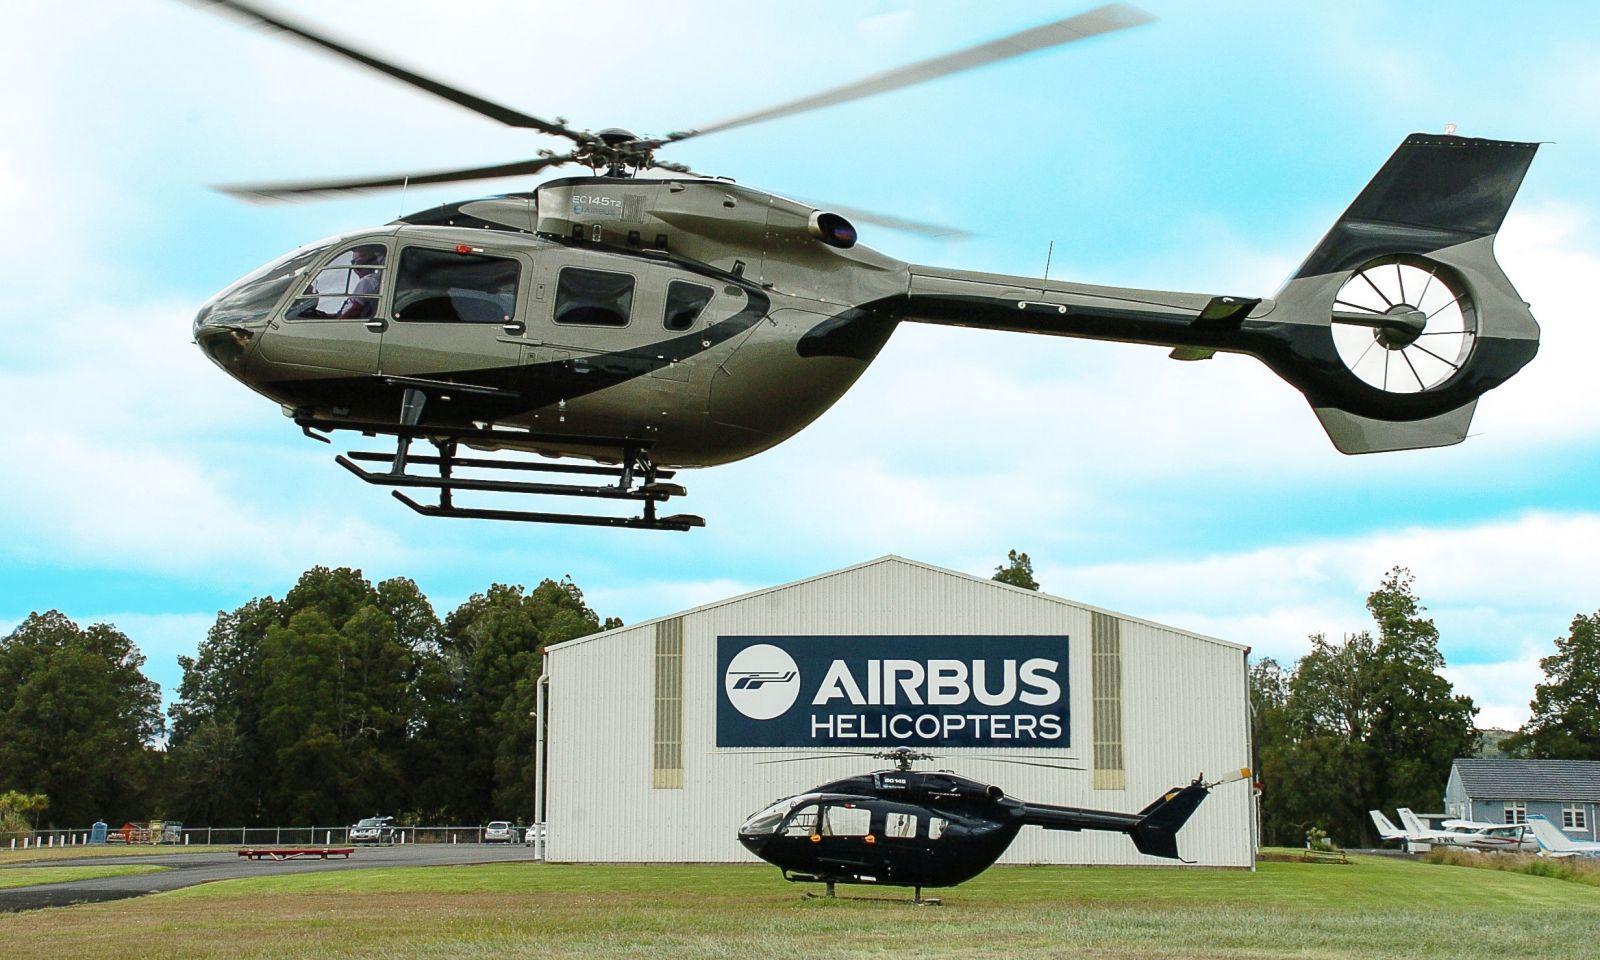 Airbus Helicopters расширяет эксплуатационные возможности вертолета H145